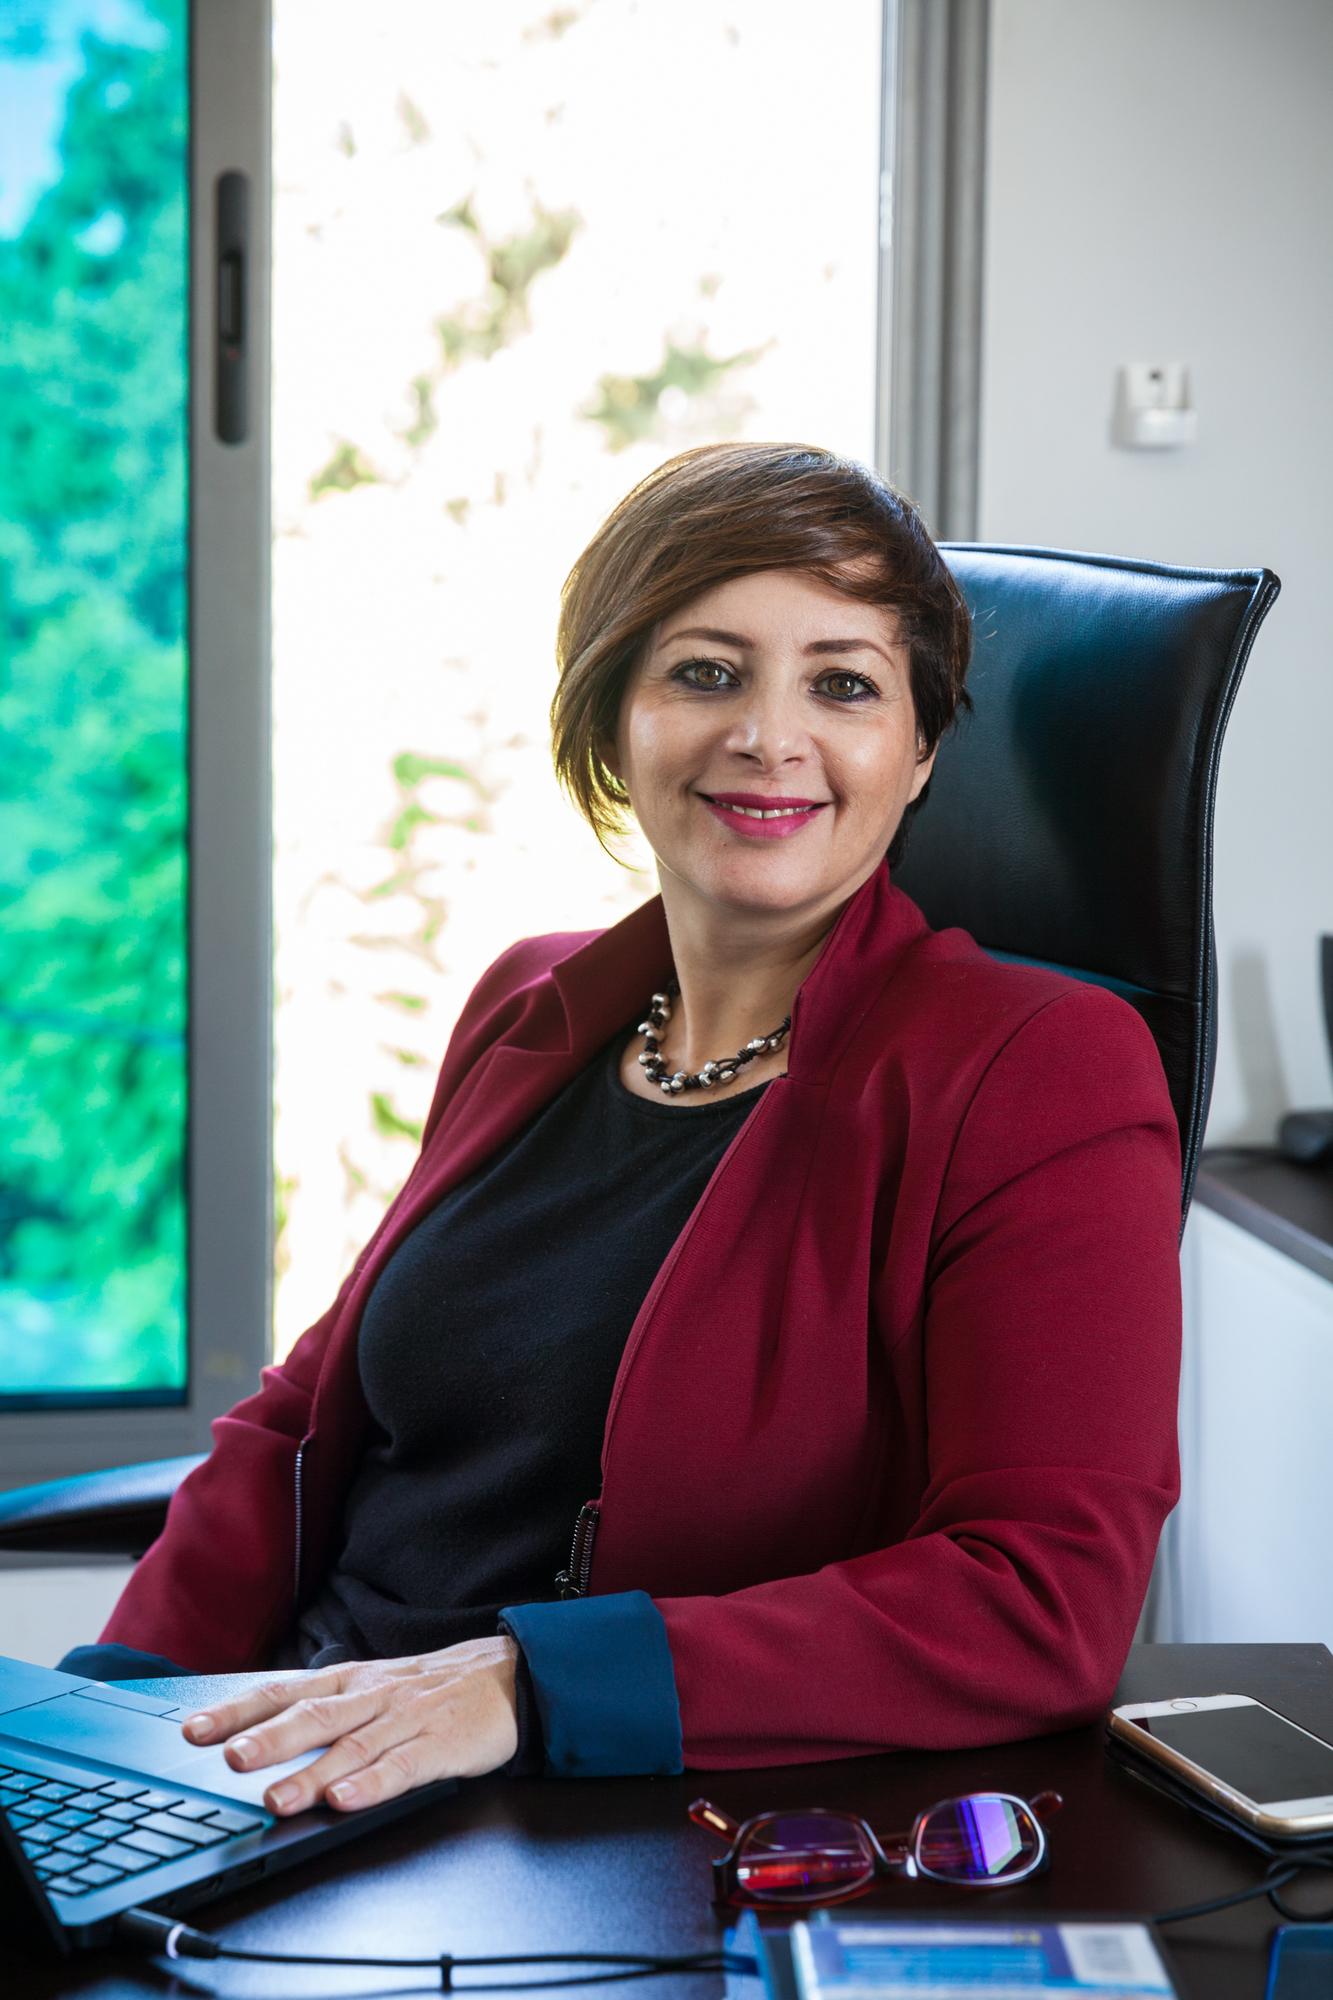 Amna Guellali (HRW) pose dans son bureau, le 7 novembre 2018.